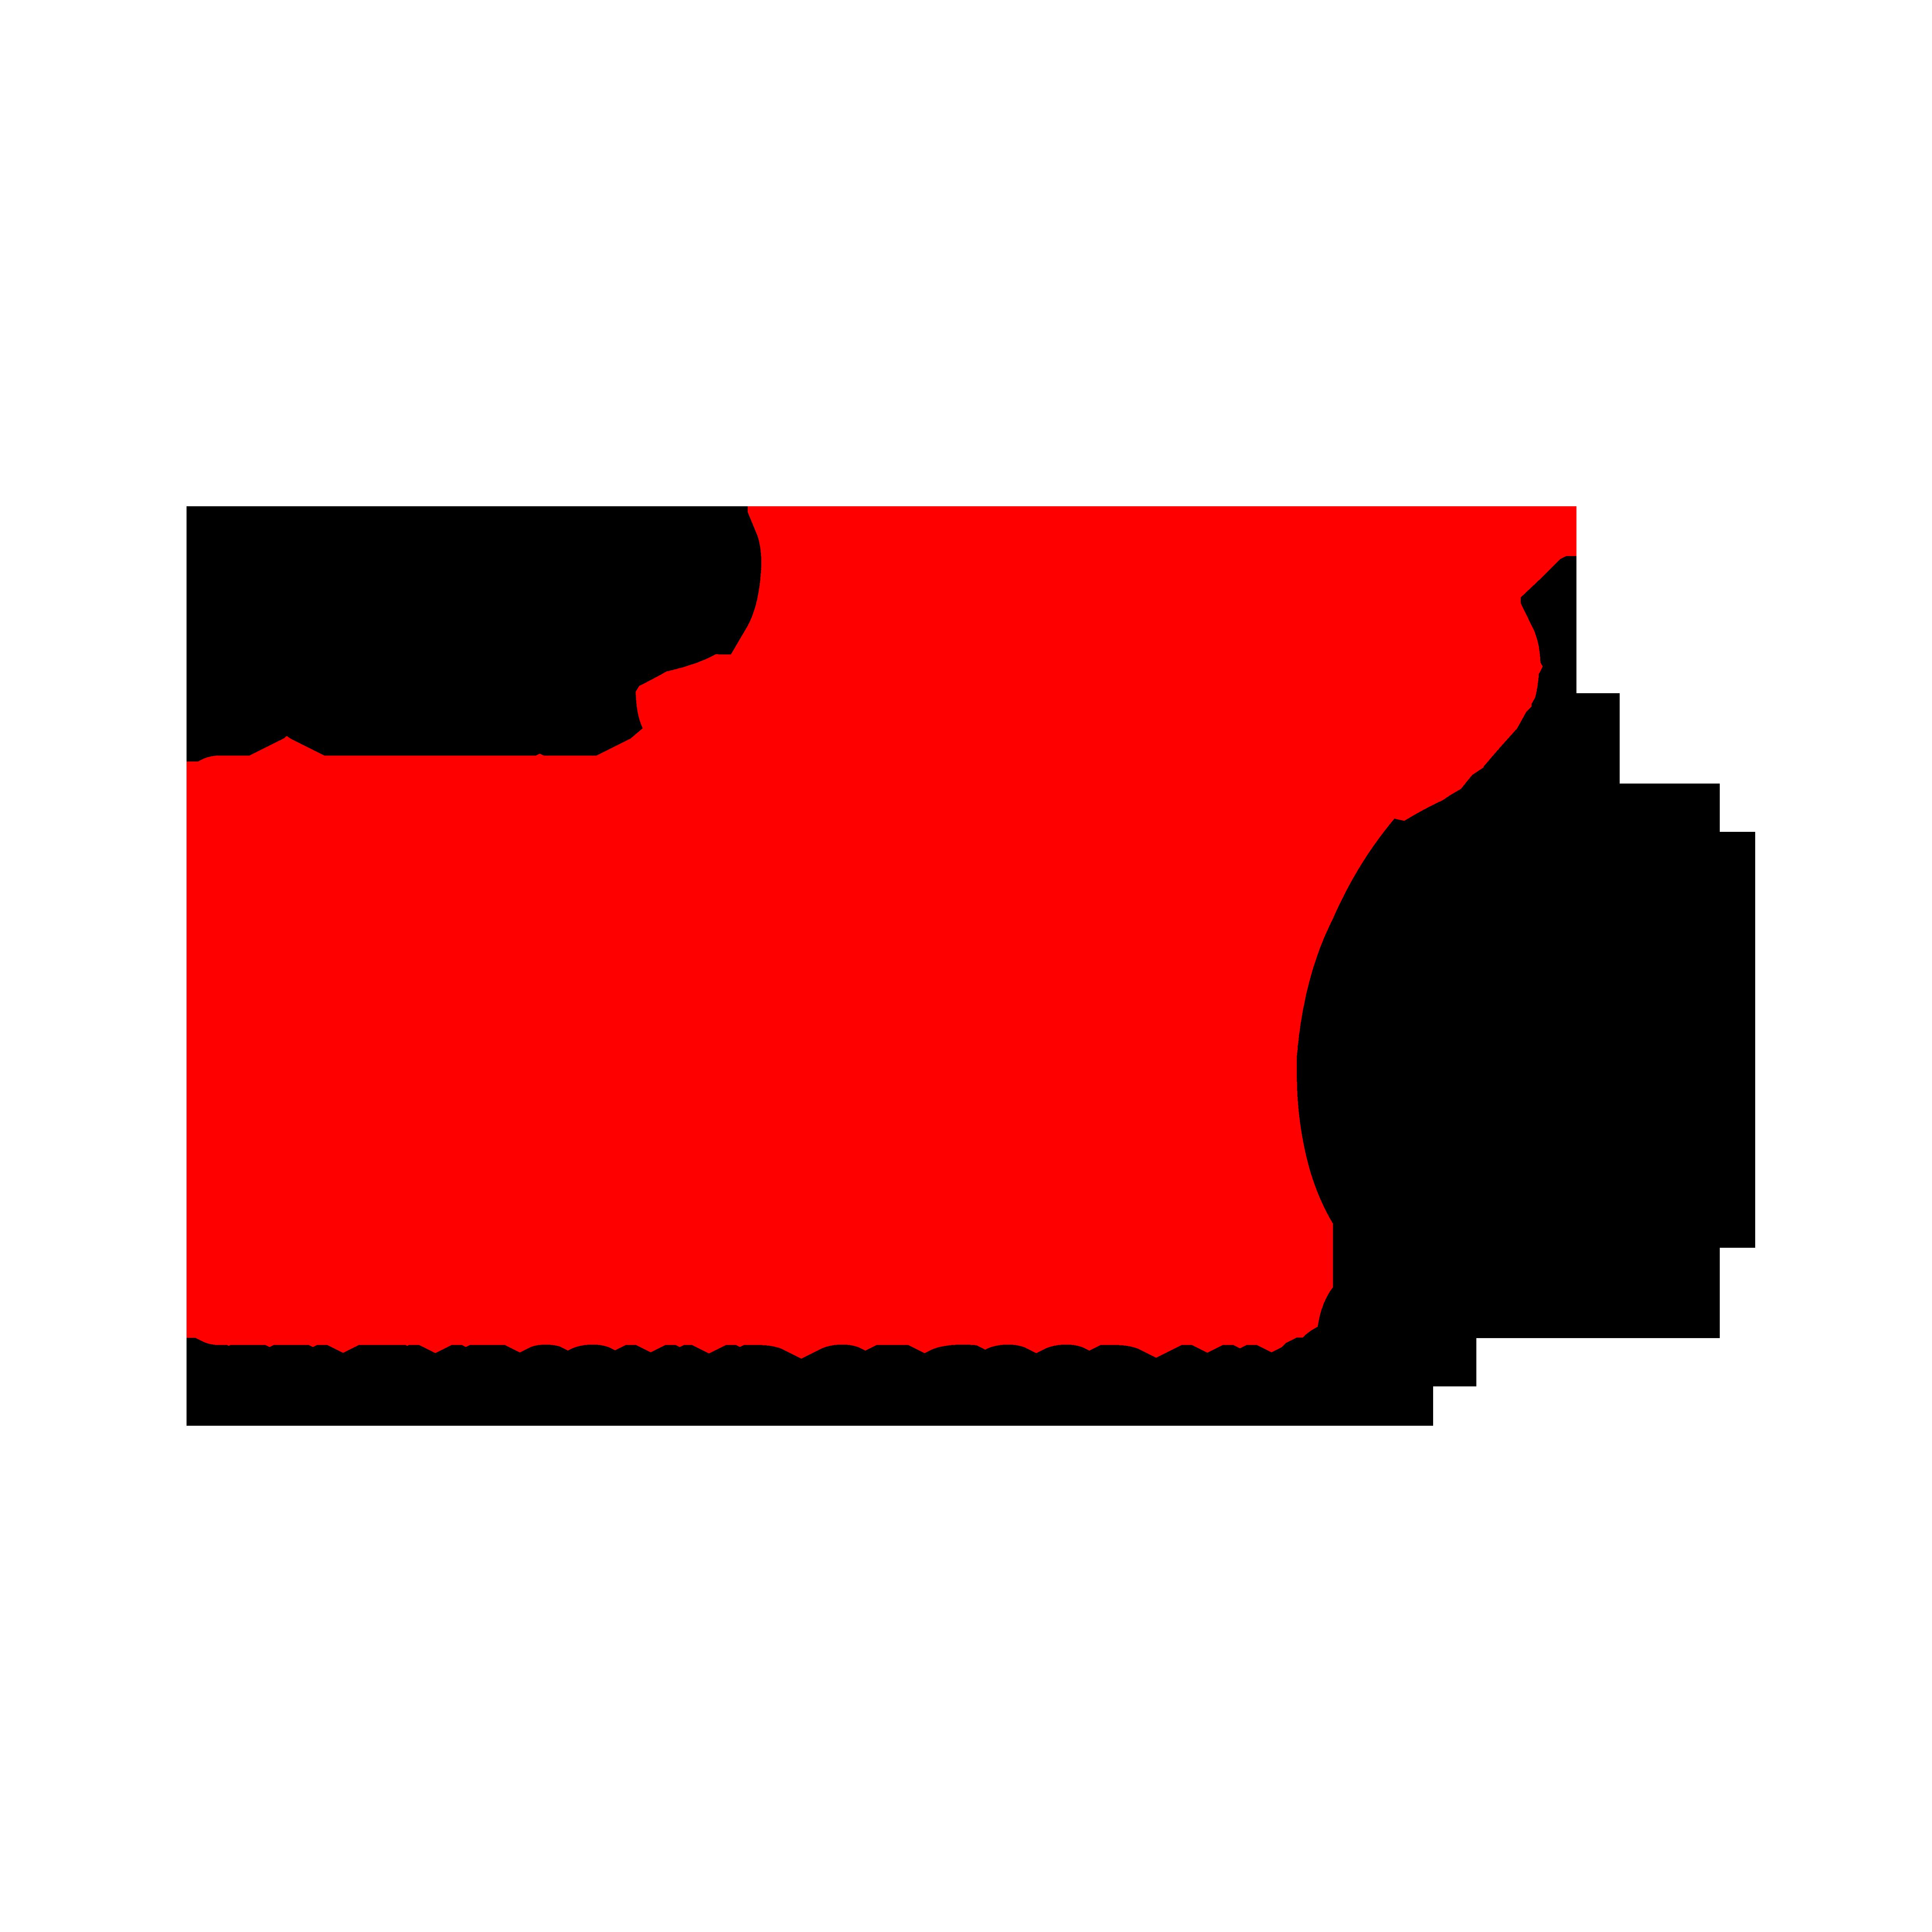 repjesusradio